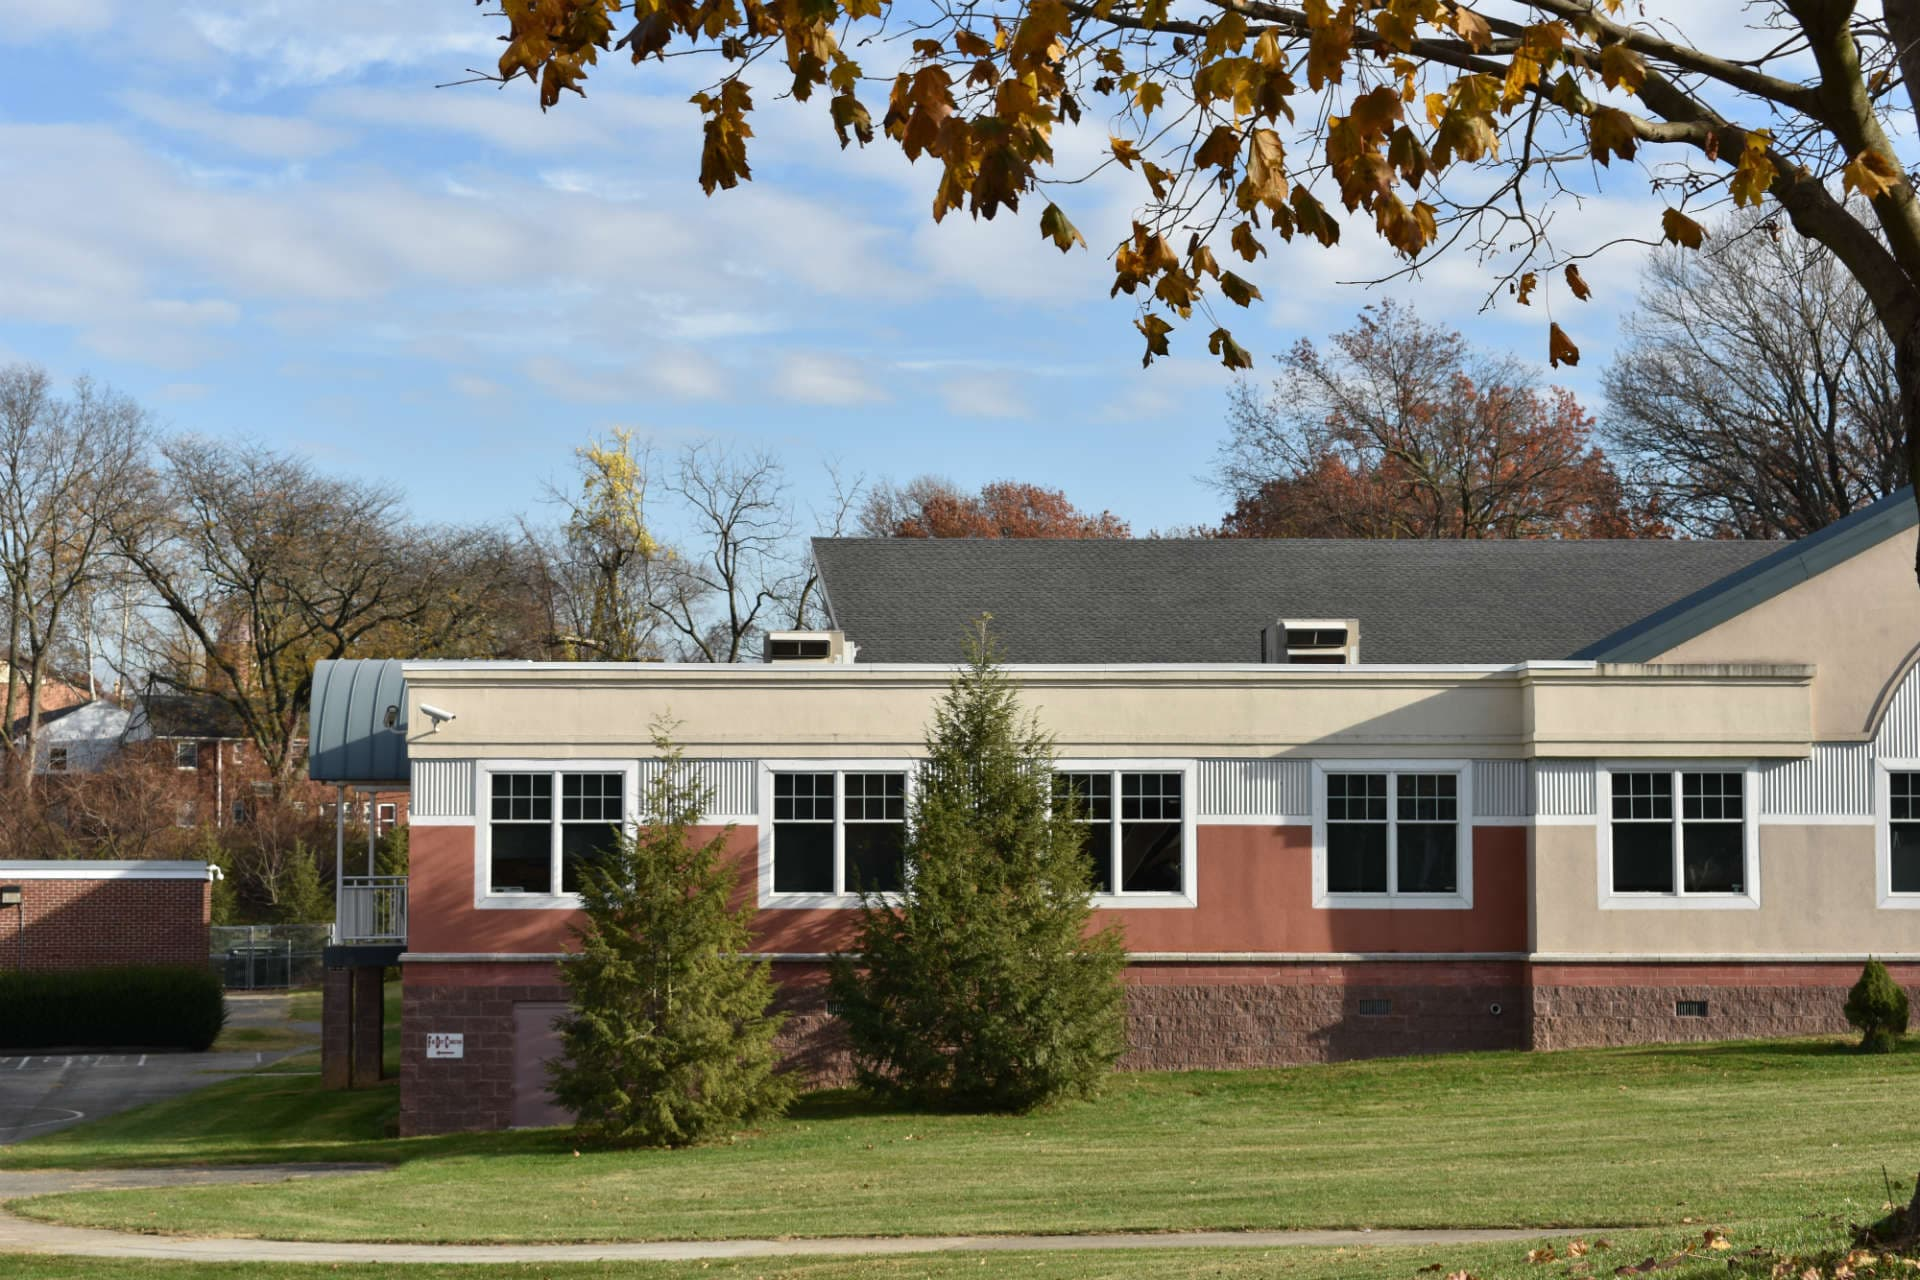 Thomas Ford Elementary School